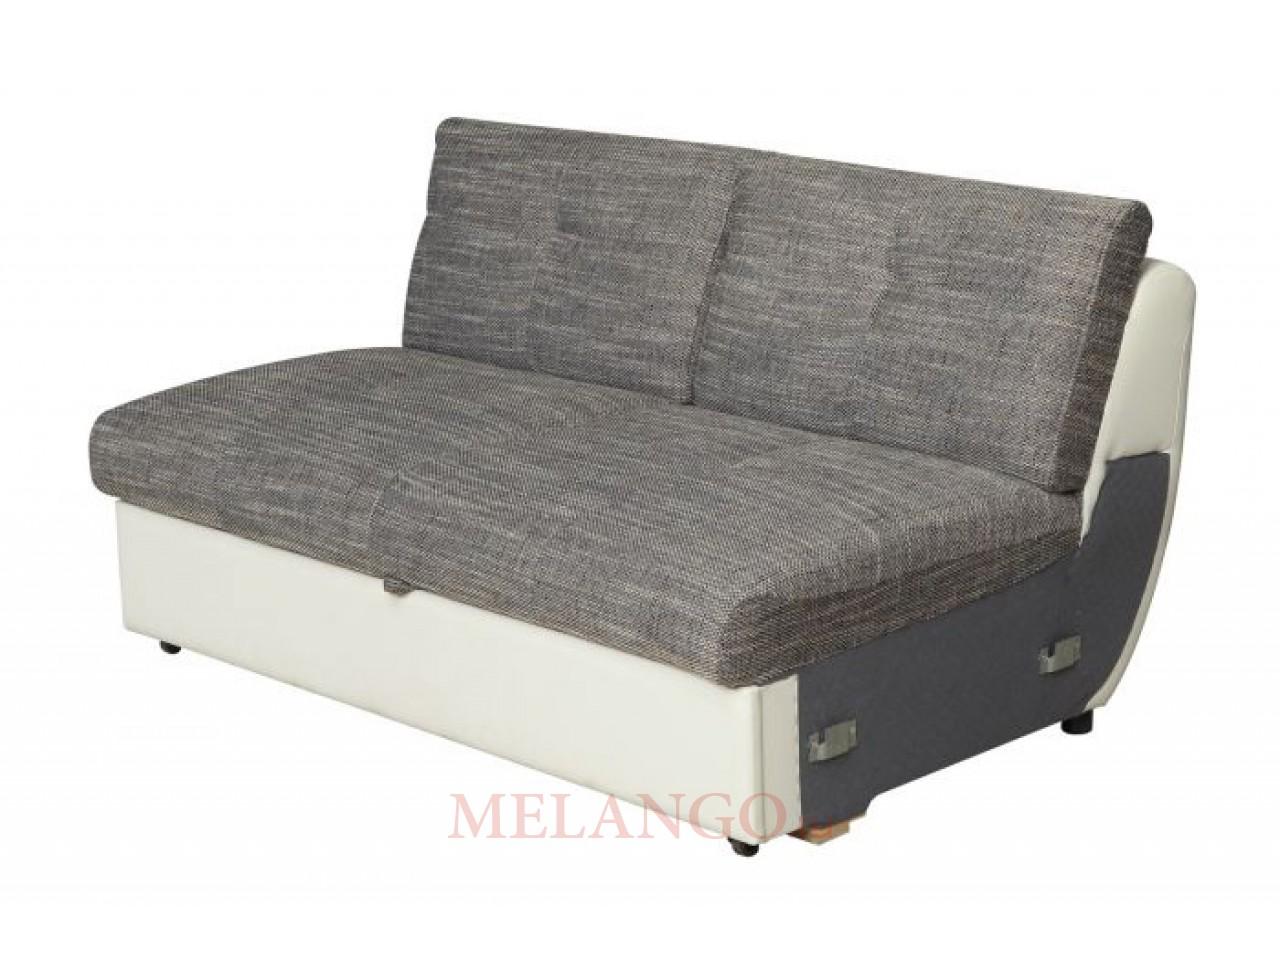 Модуль дивана Verona (Верона)125Я от Сола-М